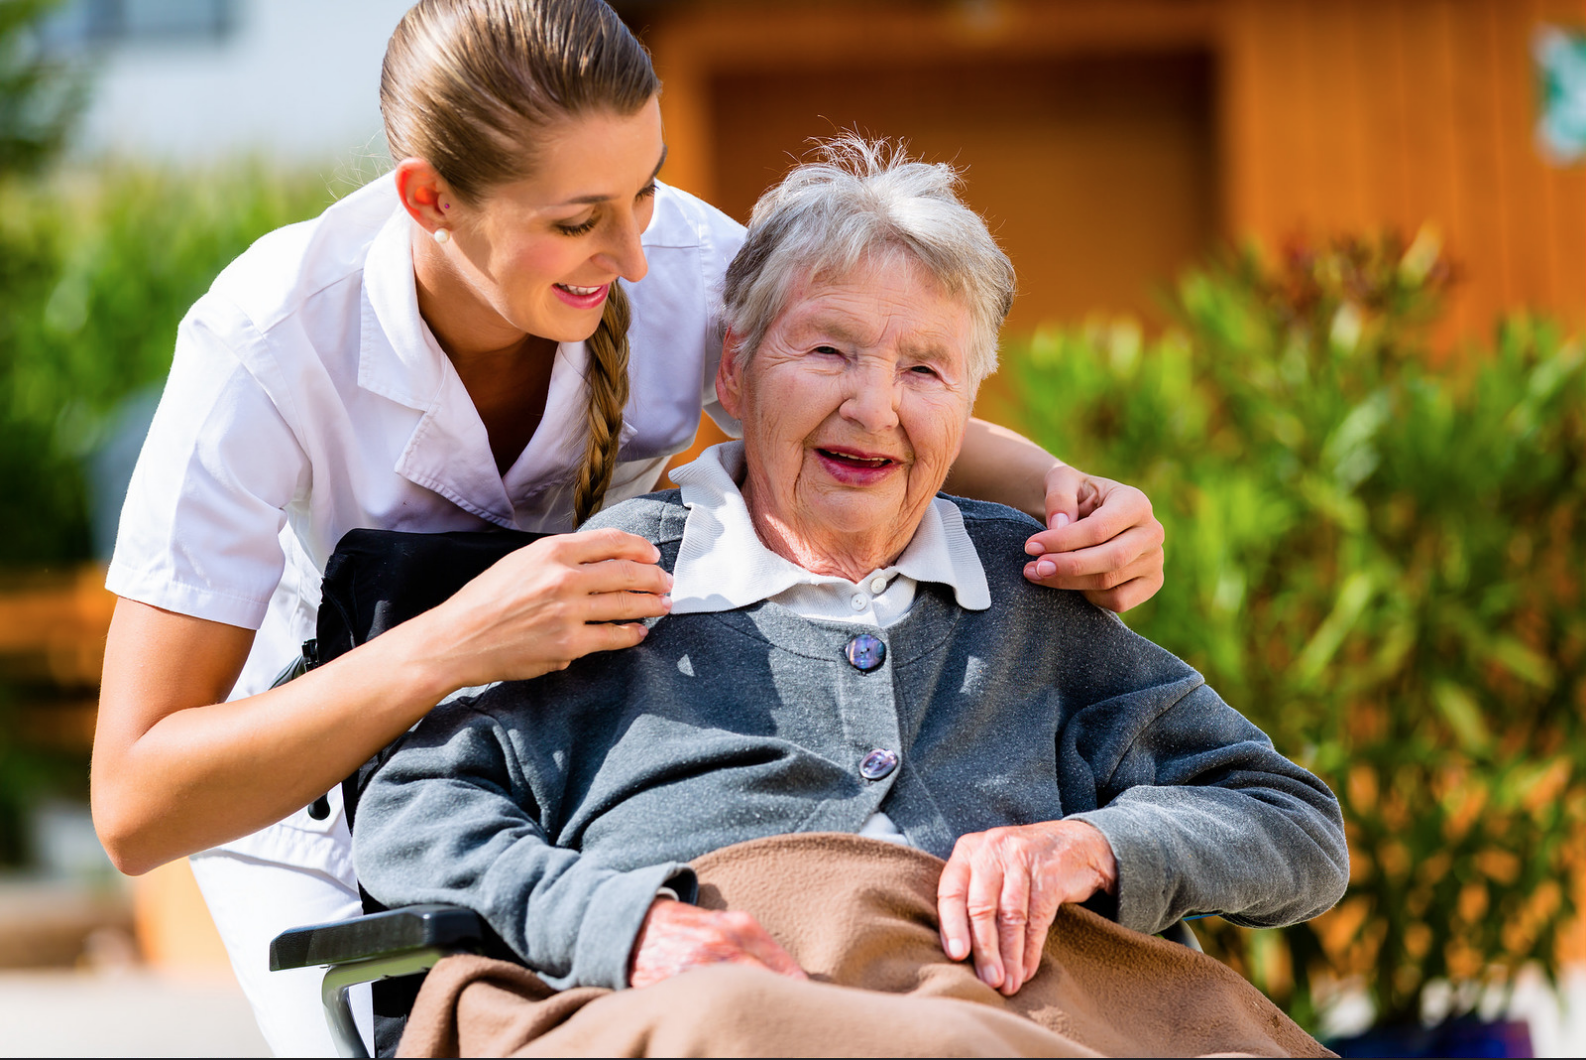 A senior smiling with her caregiver